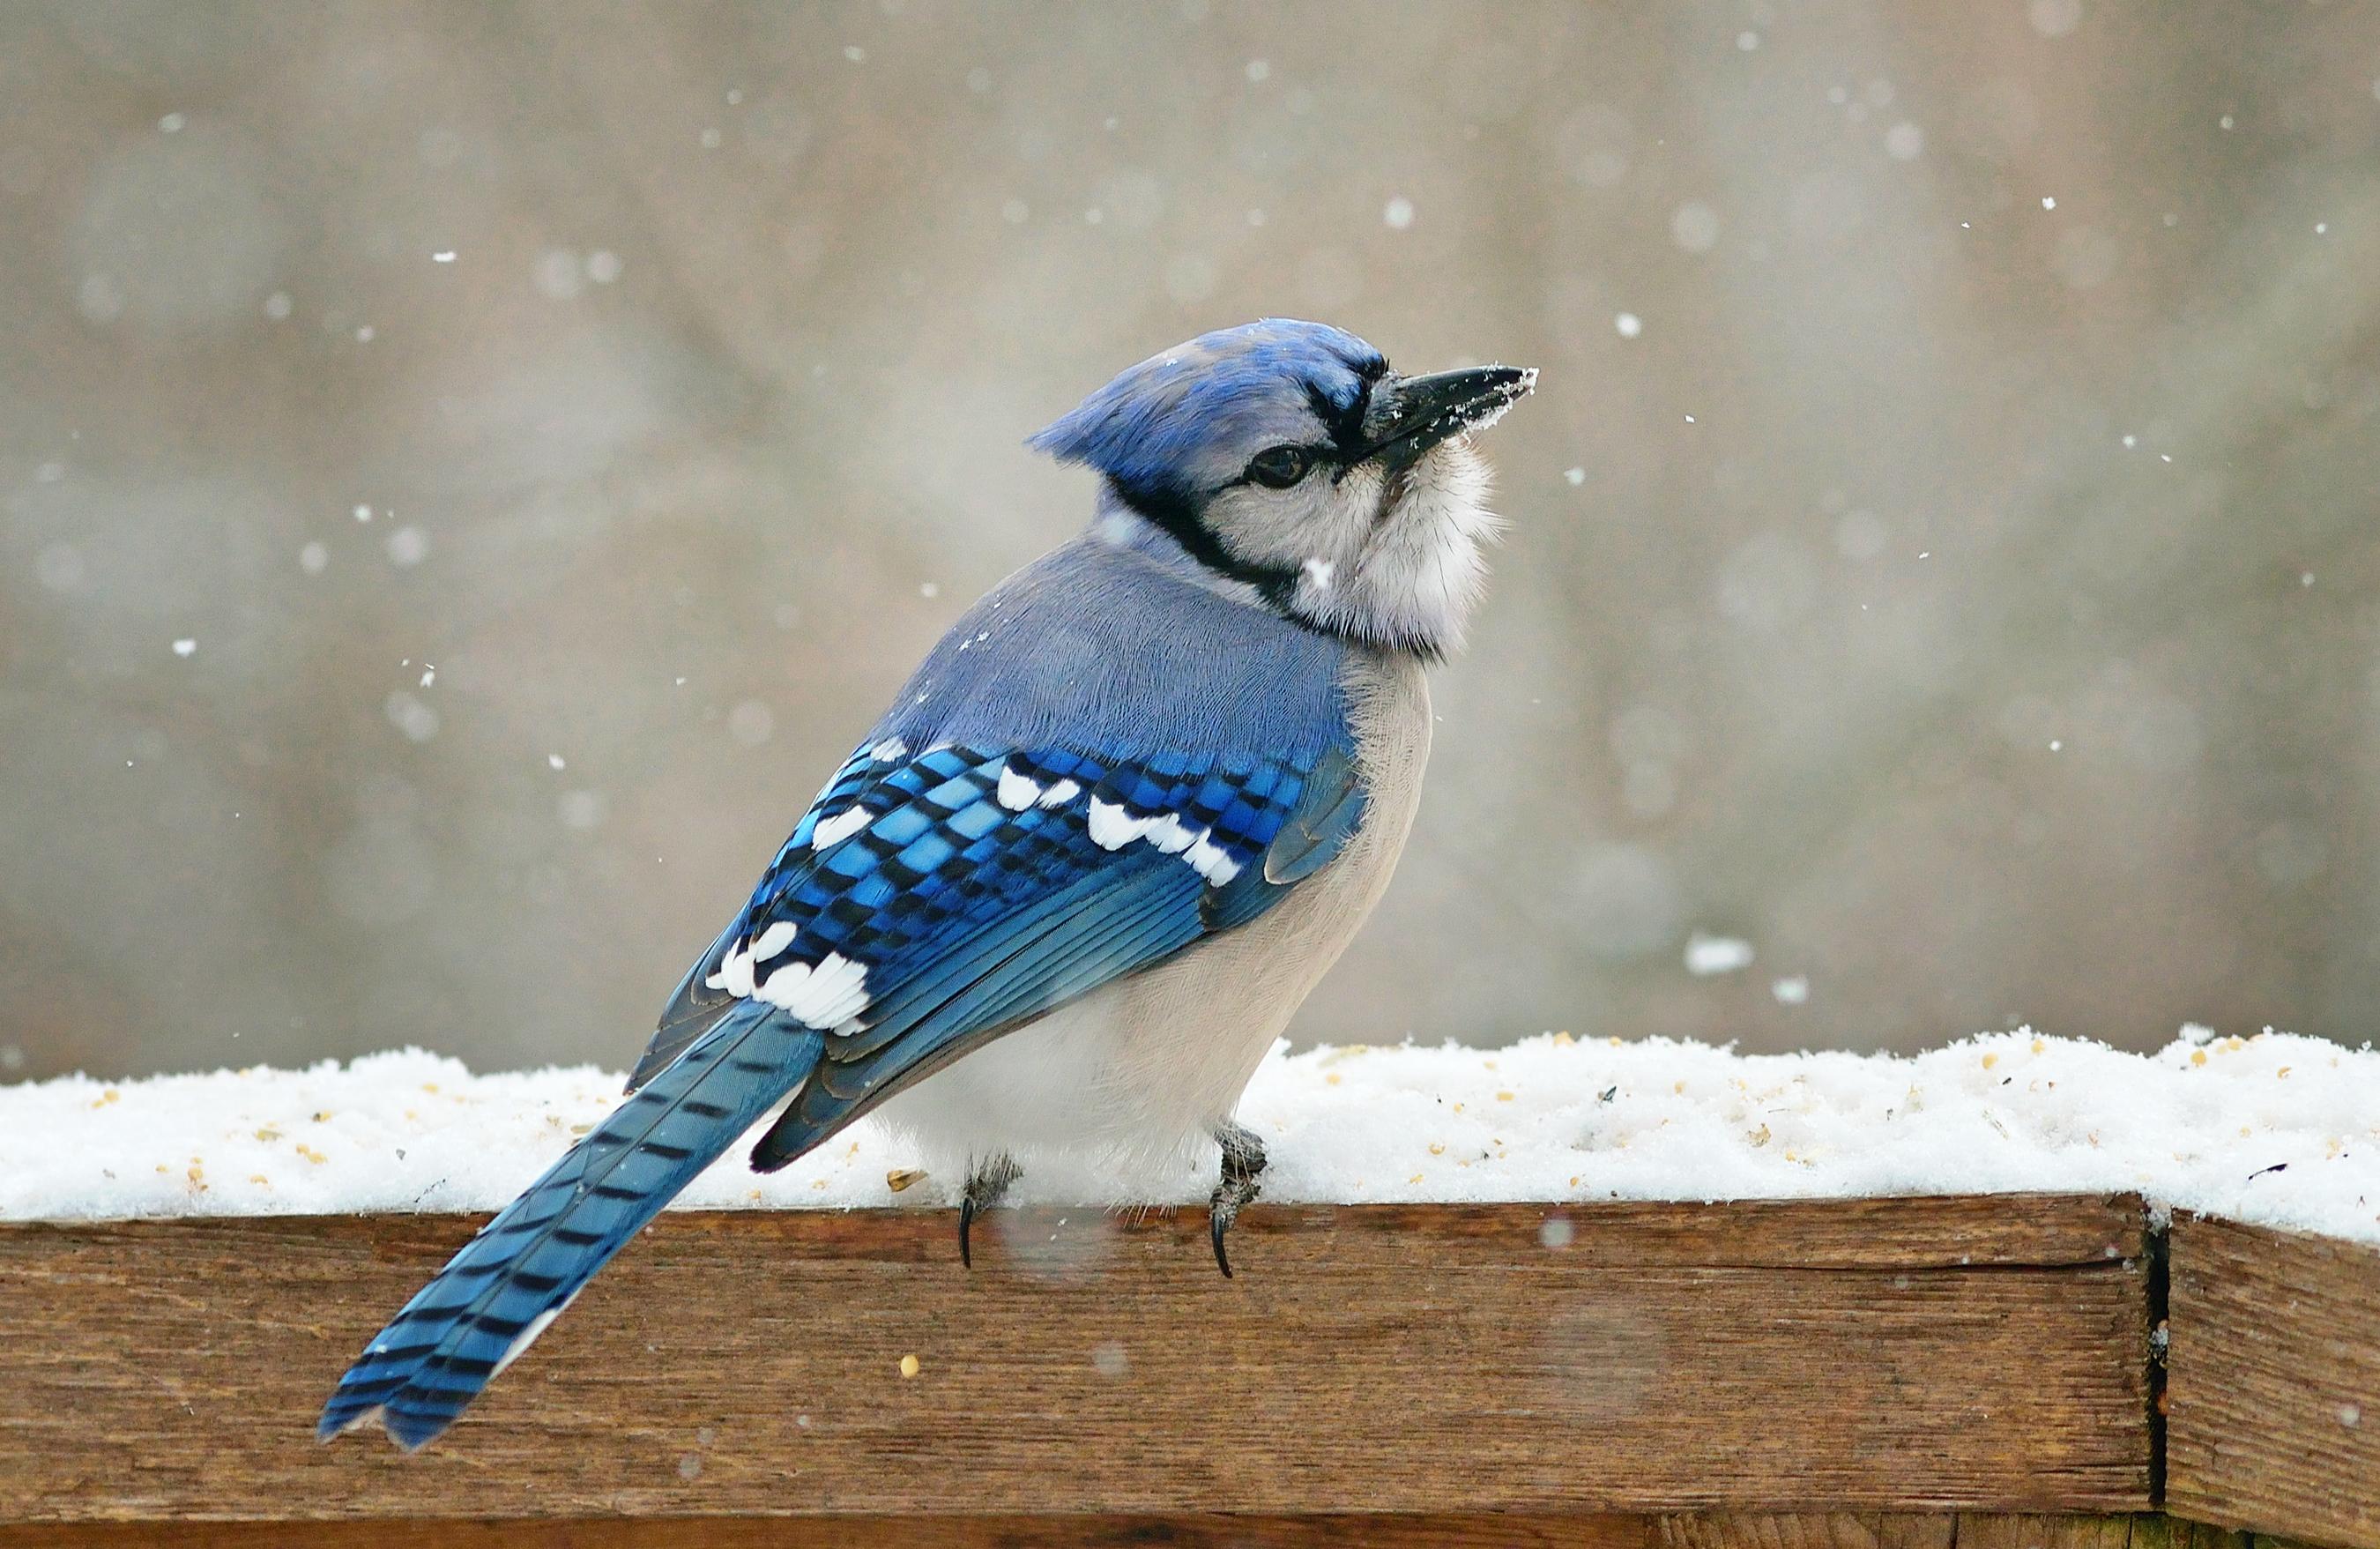 странице зимние птички фото семье без